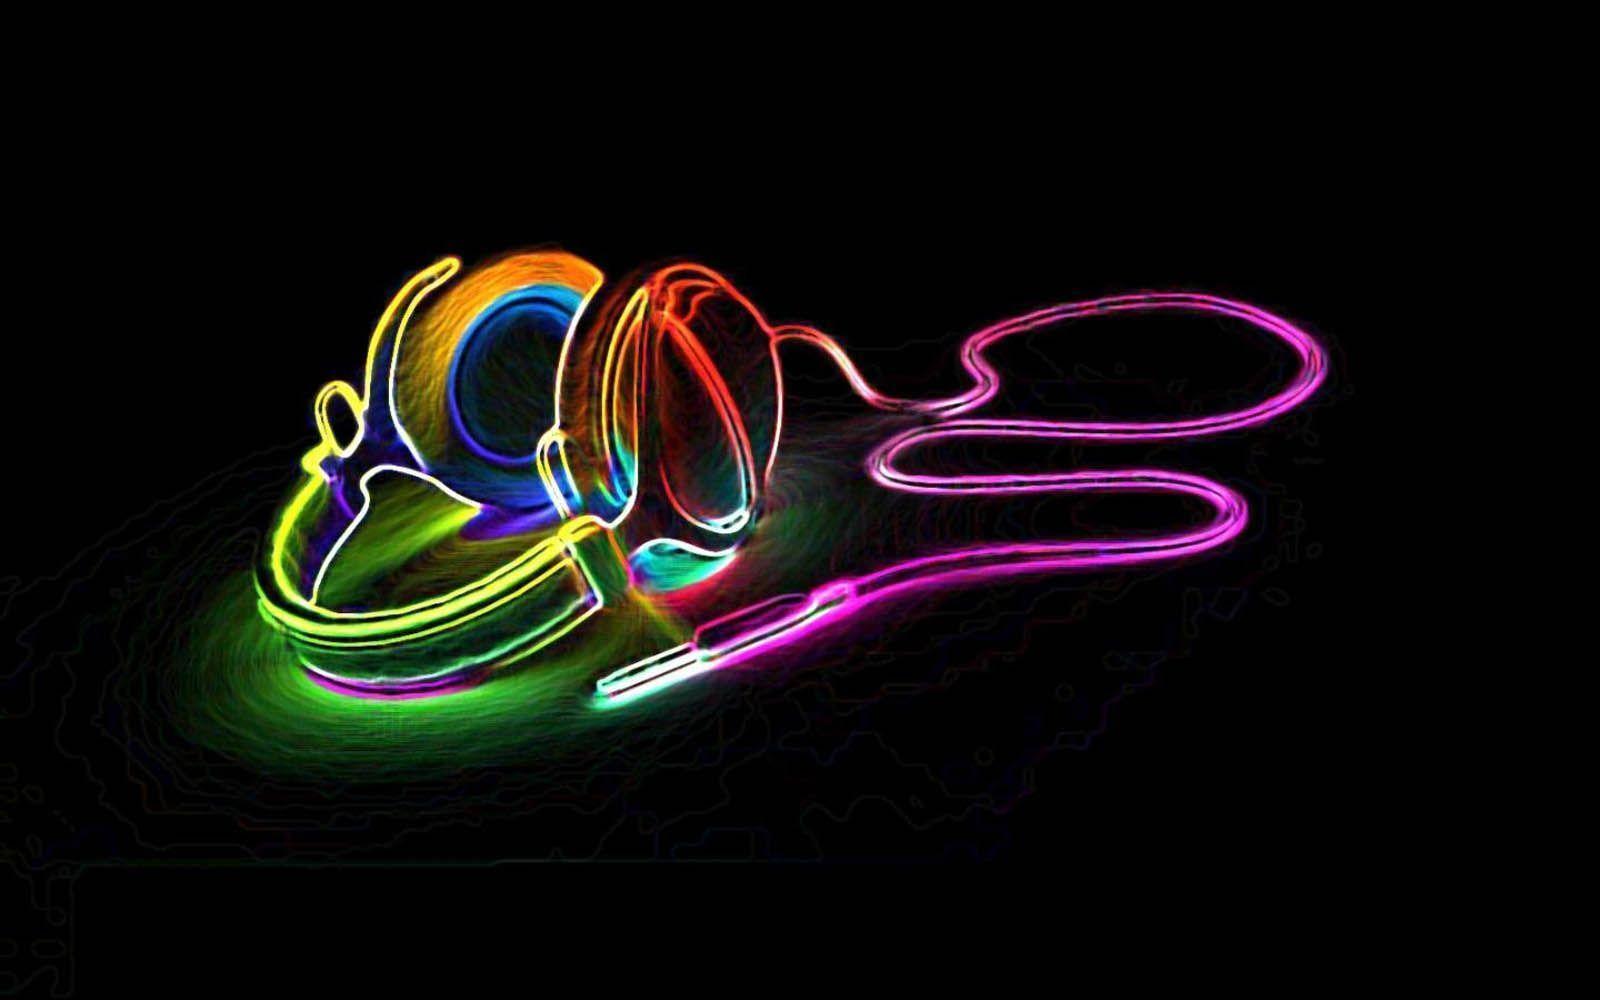 Cool Neon Wallpapers 106891 Best HD